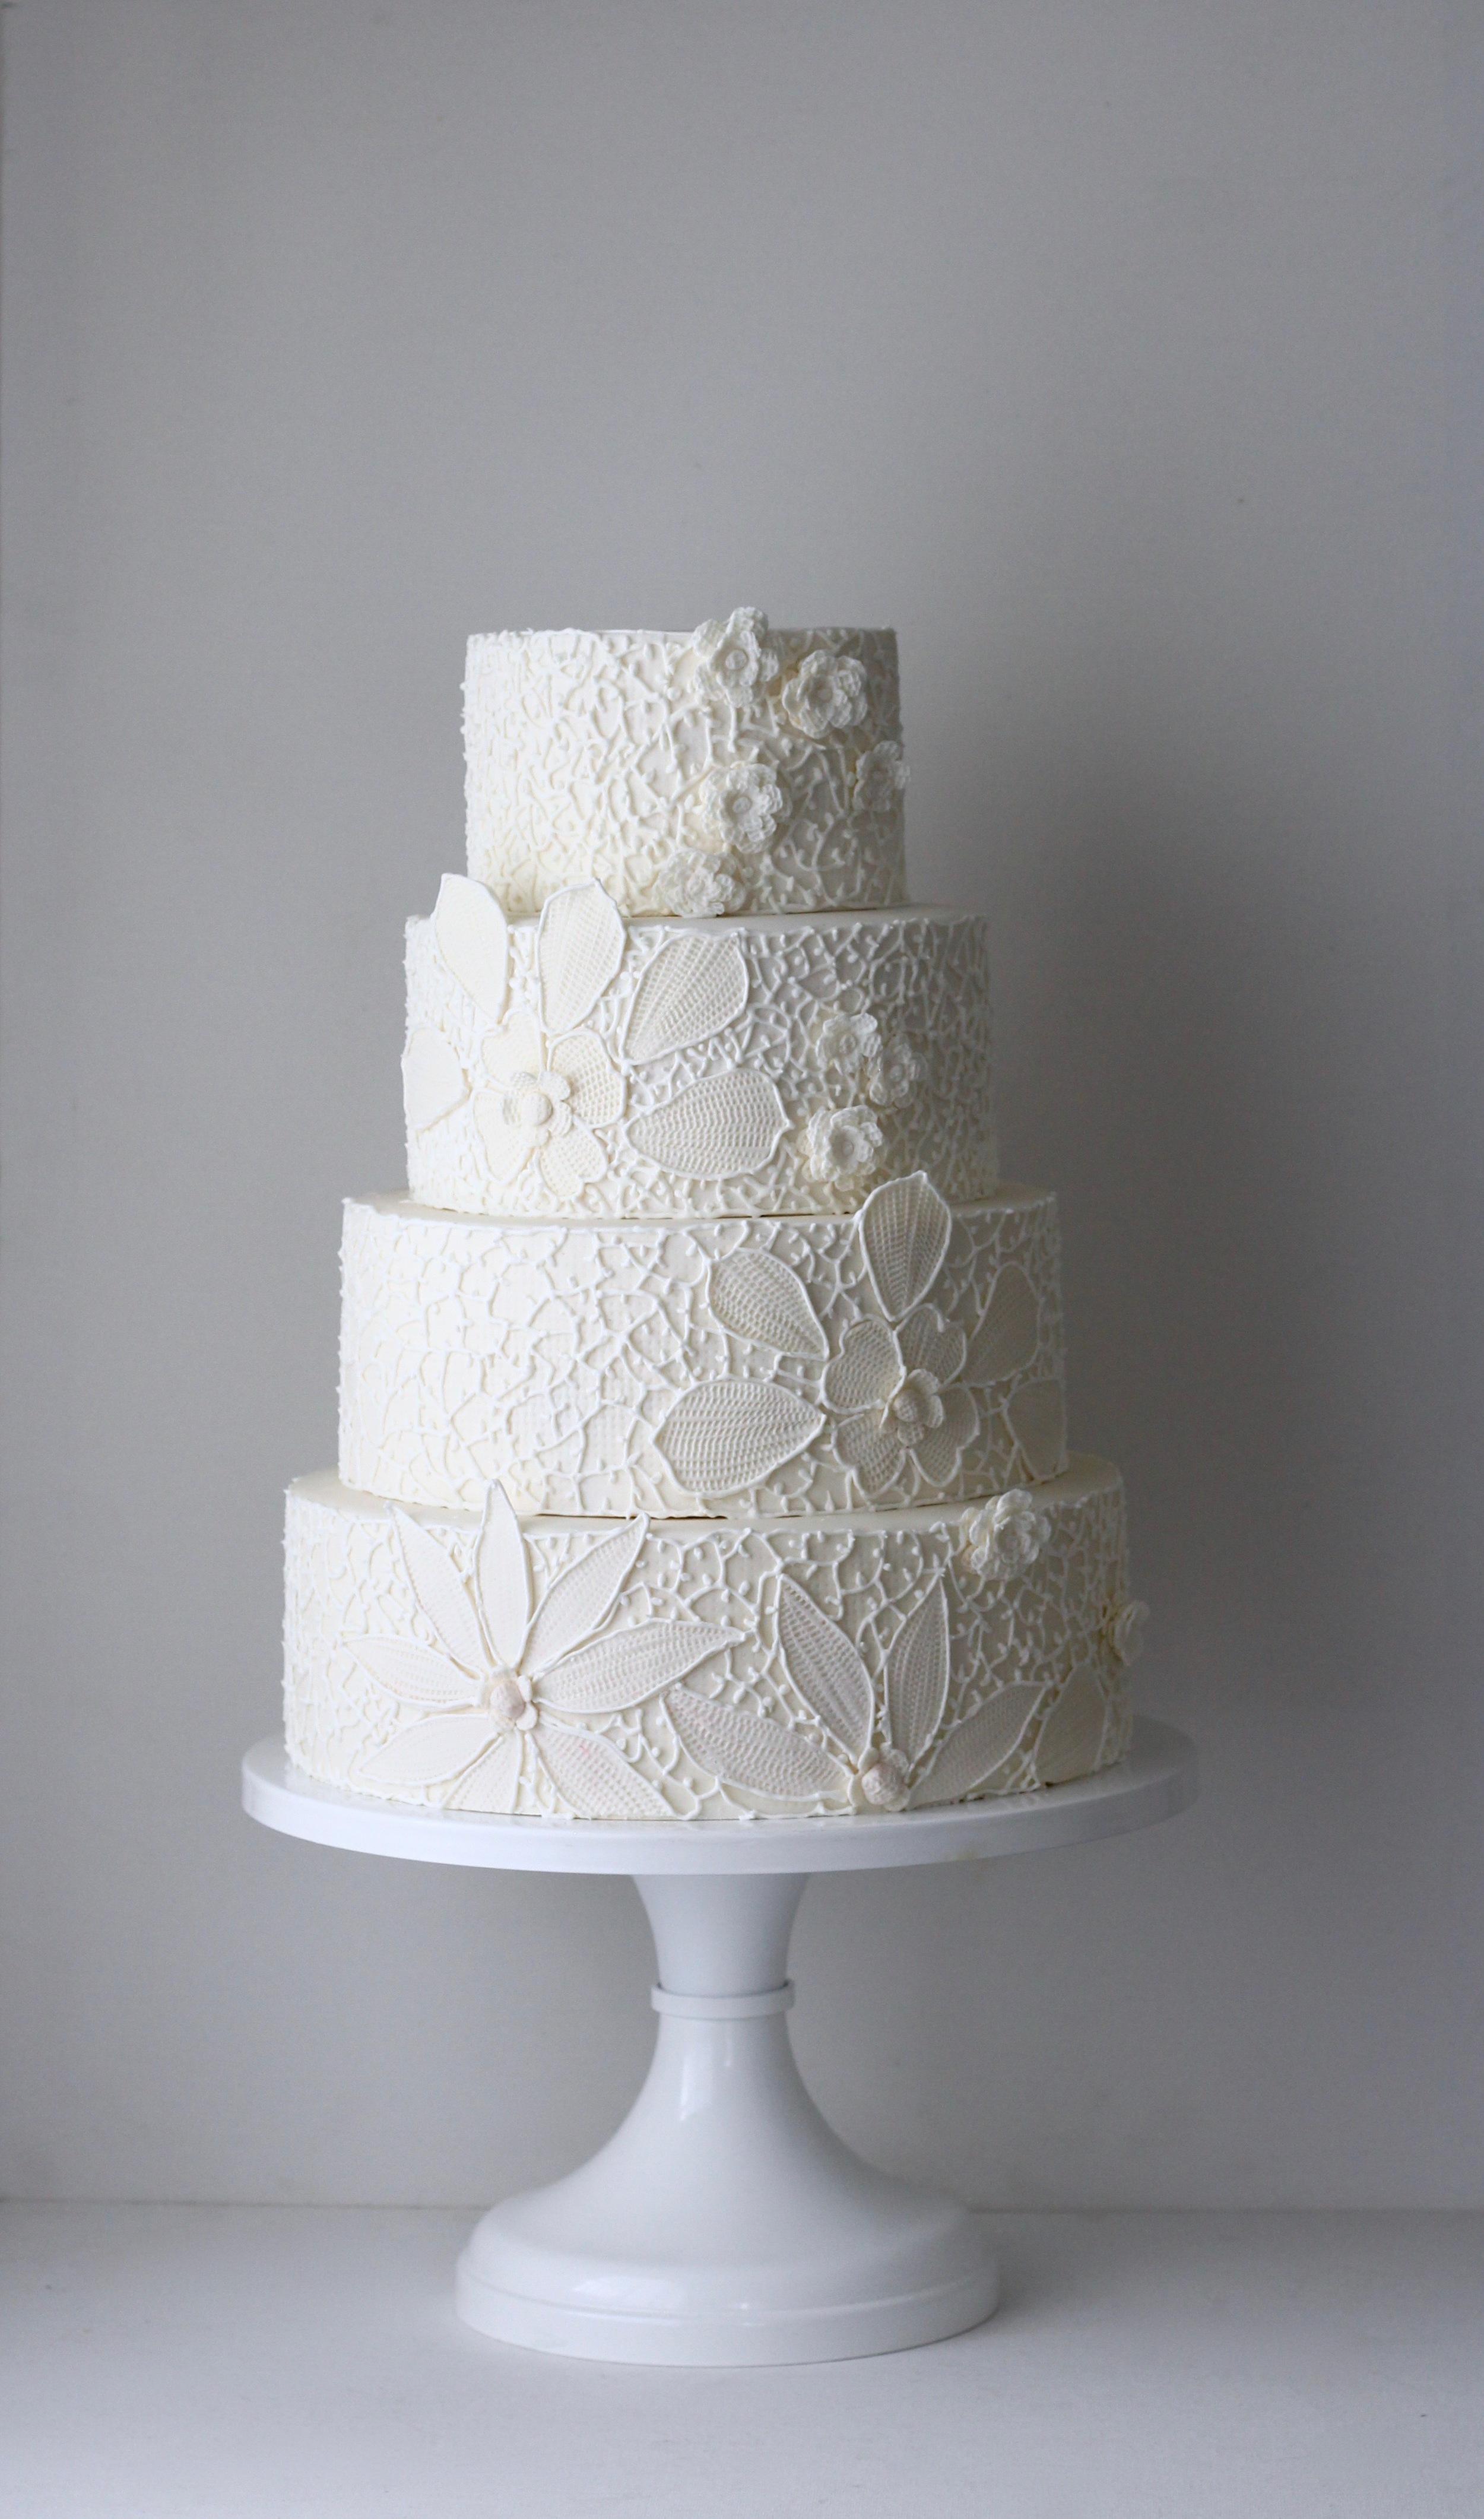 Irish crochet lace inspired wedding cake by jaime gerard cake